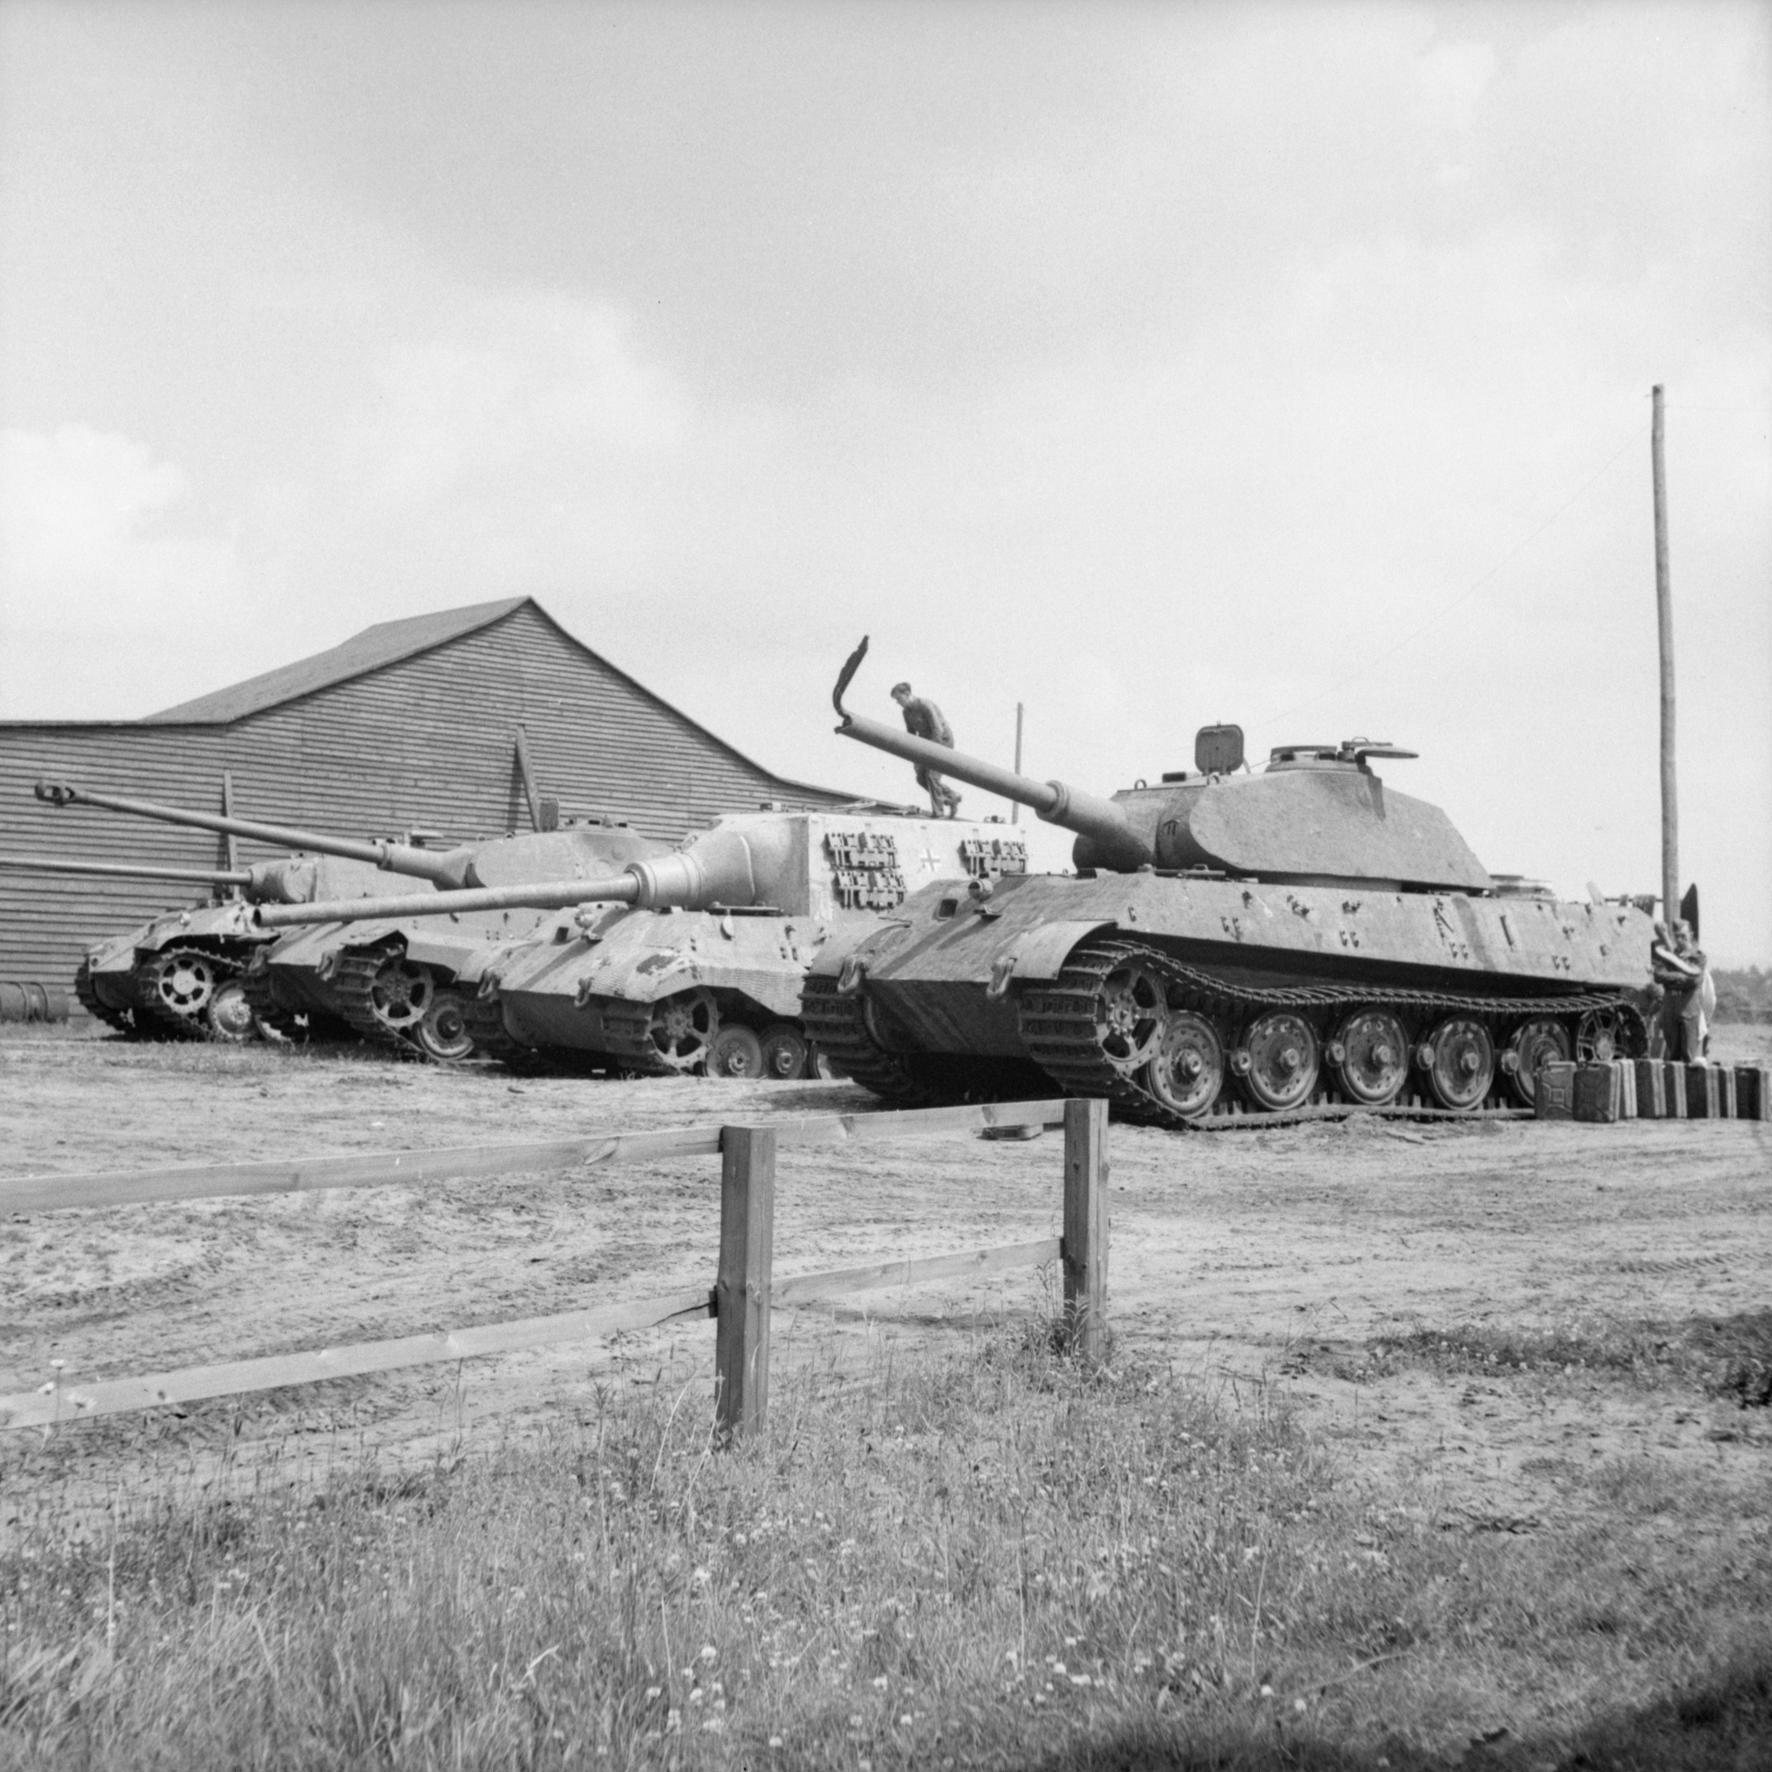 BU 8016 Four German heavy tanks at the Henschel tank testing ground at Haustenbeck near Paderborn Germany June 1945.